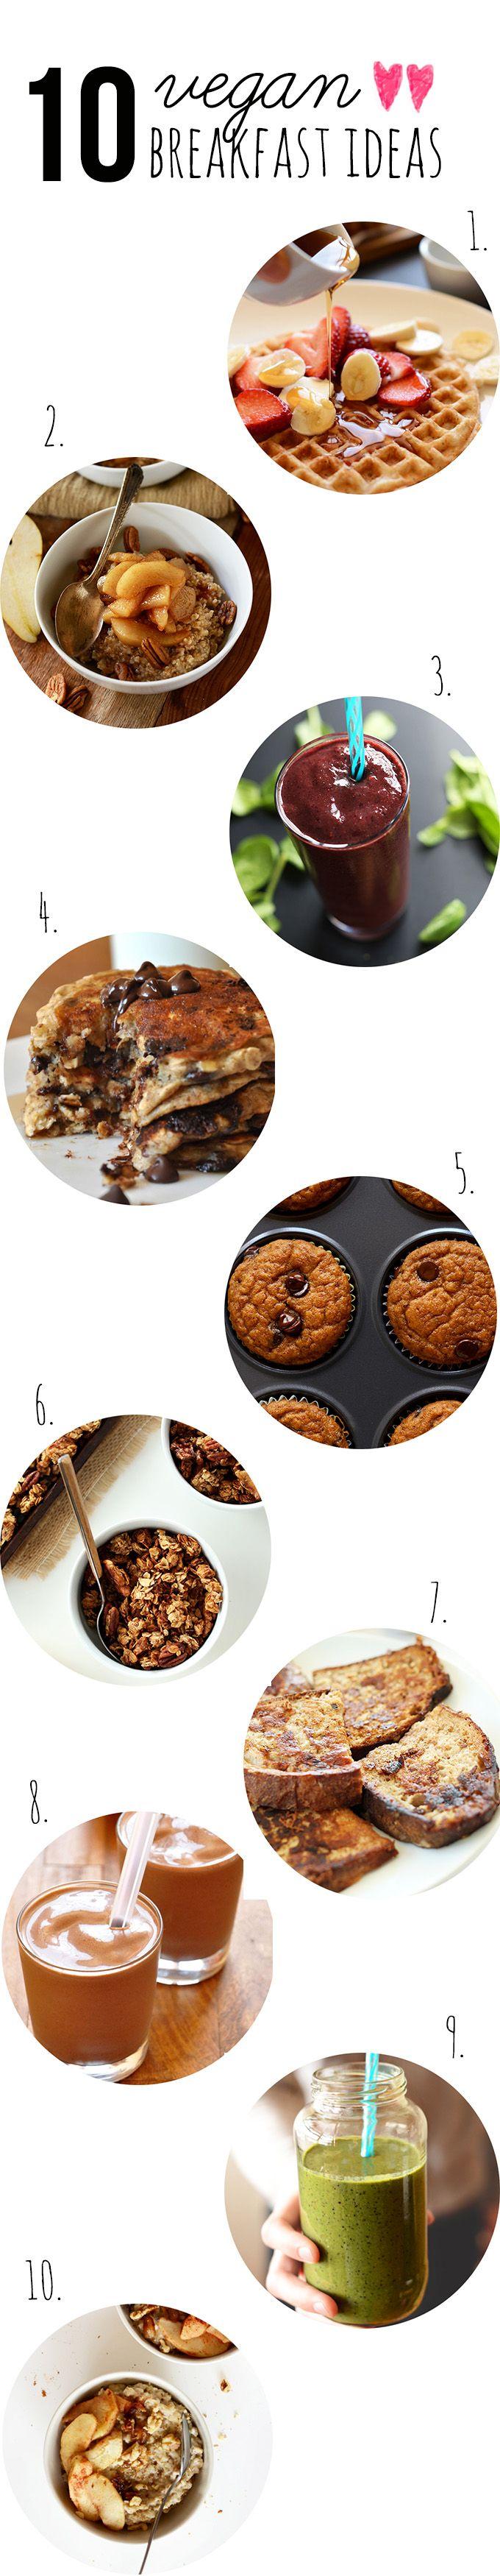 10 Vegan Breakfast Ideas! #vegan #breakfast